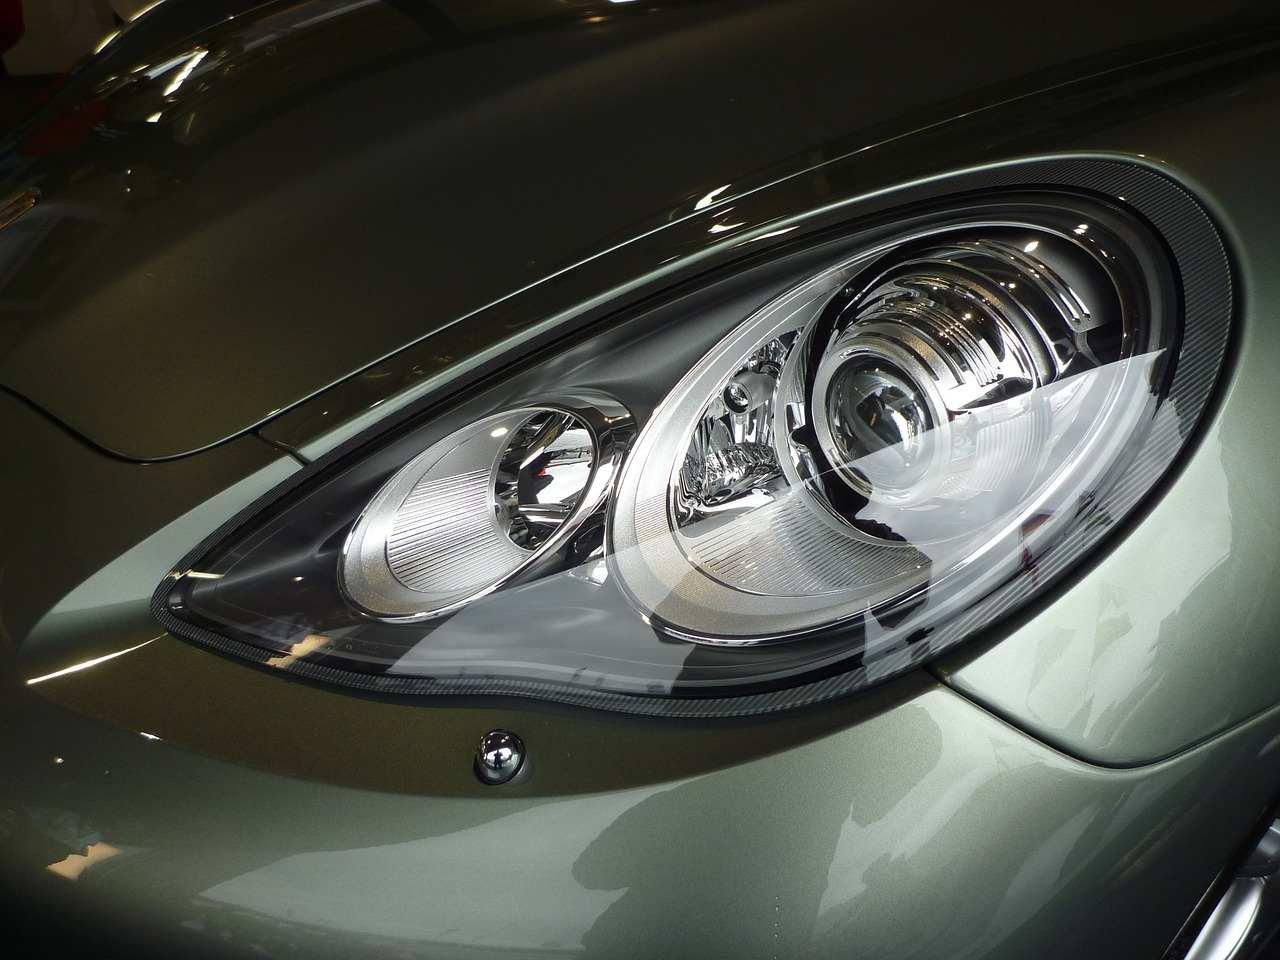 projector vs reflector headlights